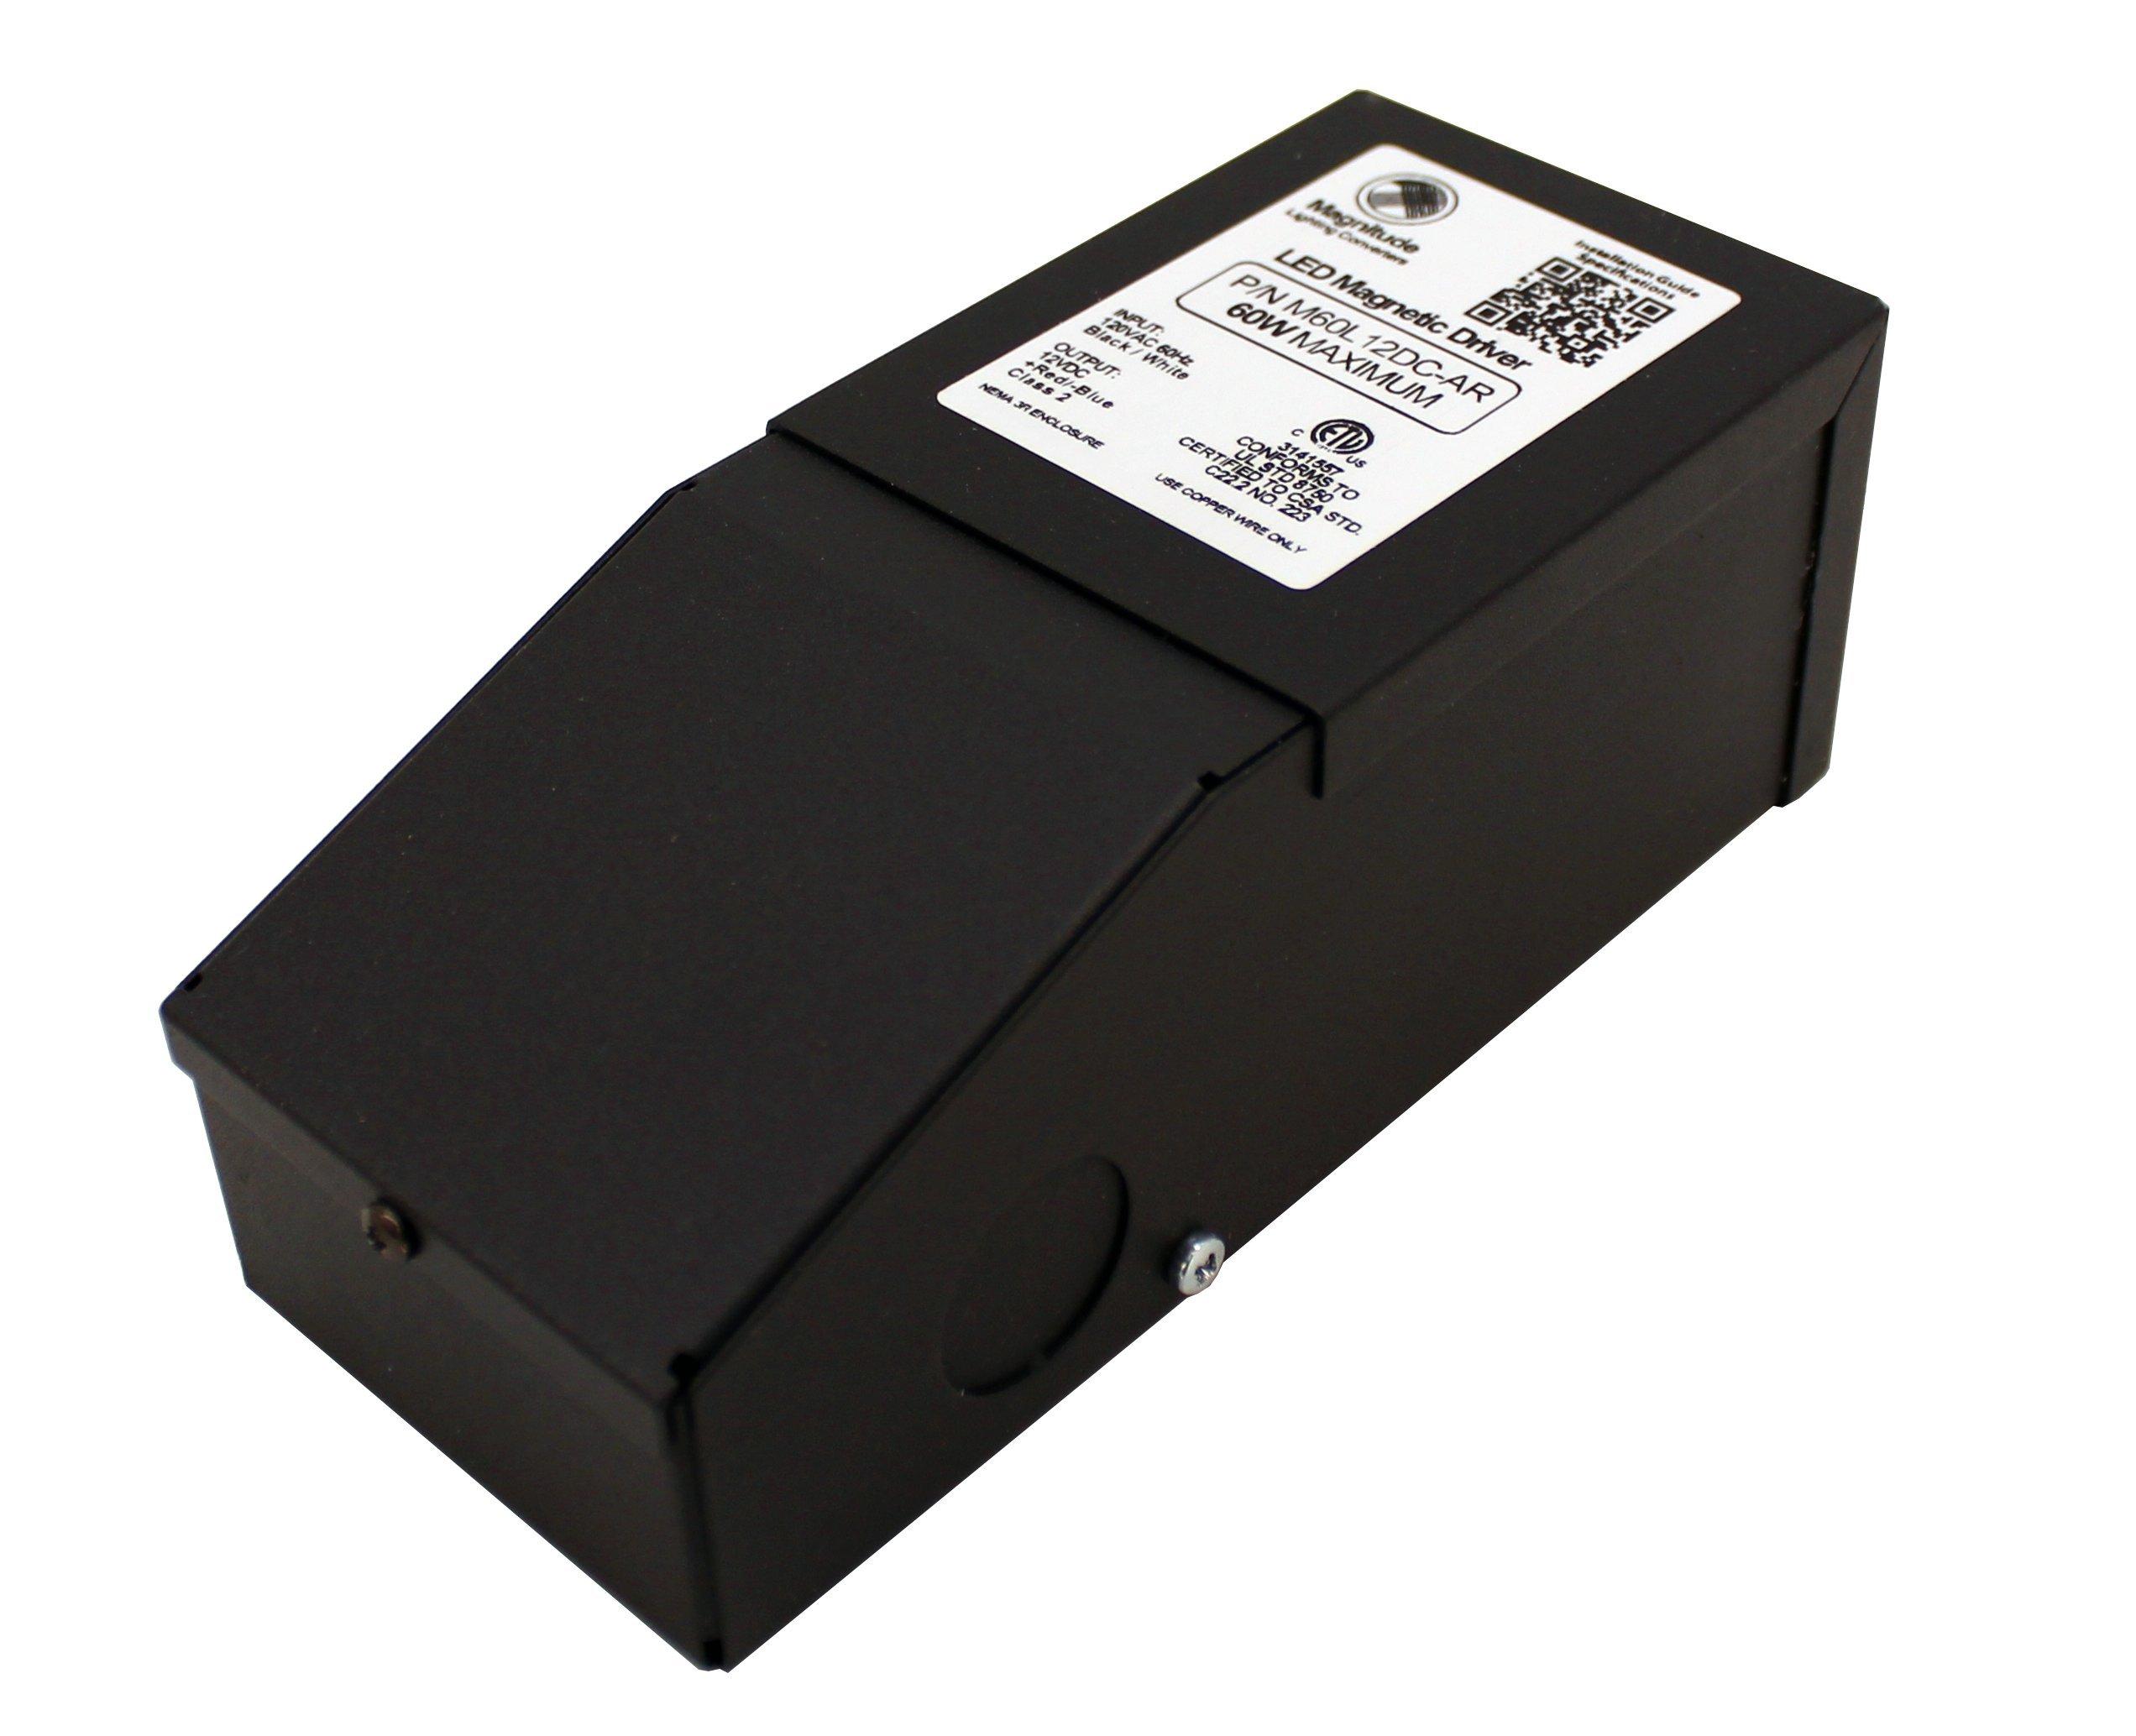 12V Magnitude Magnetic Dimmable LED Driver Transformer Hardwired Under Cabinet Lighting 60 Watt - Inspired LED by Inspired LED (Image #2)